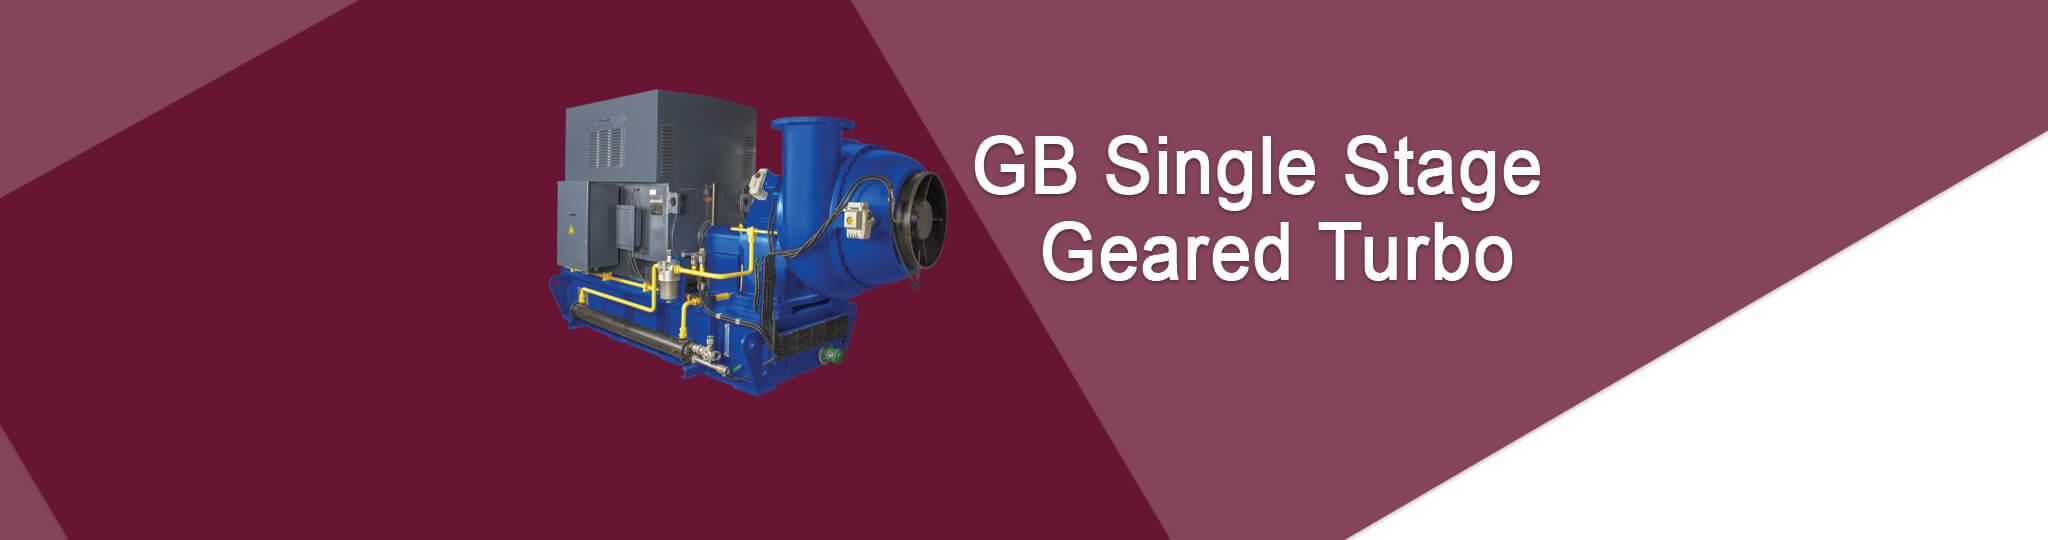 GB-Single-Stage-Geared-Turbo